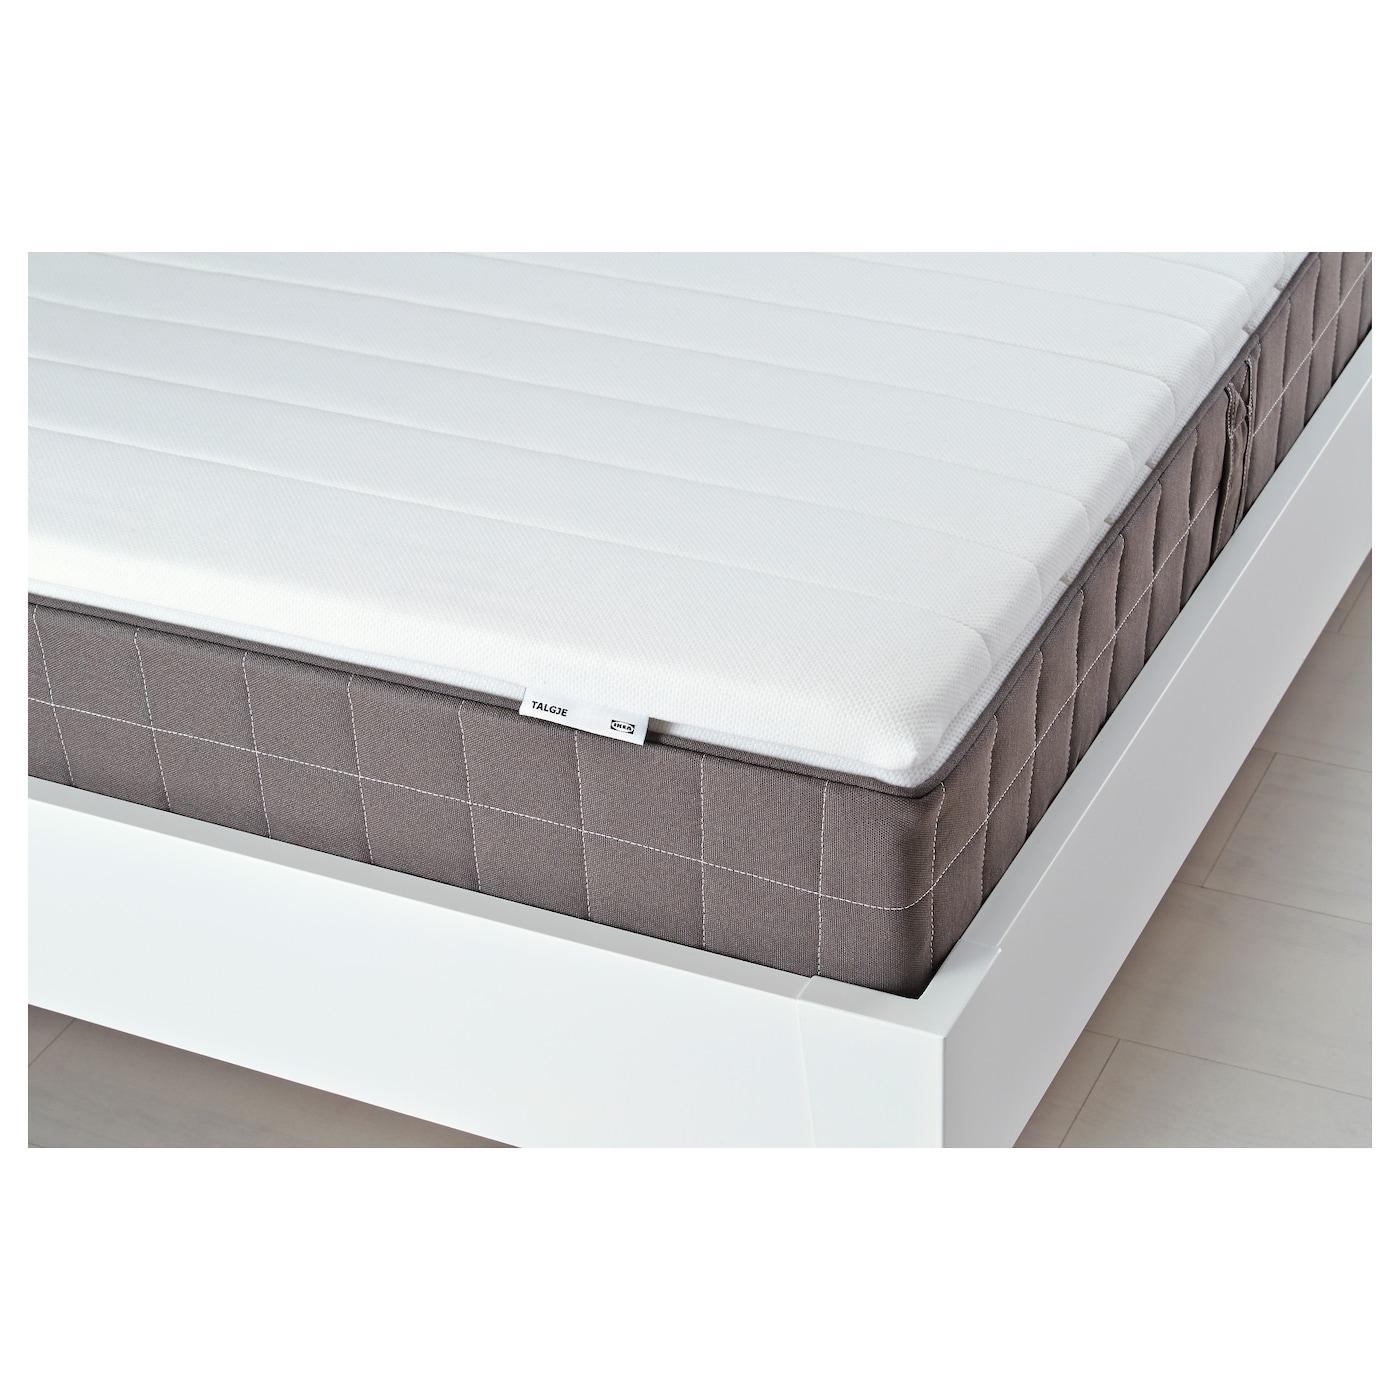 talgje mattress topper white standard double ikea. Black Bedroom Furniture Sets. Home Design Ideas